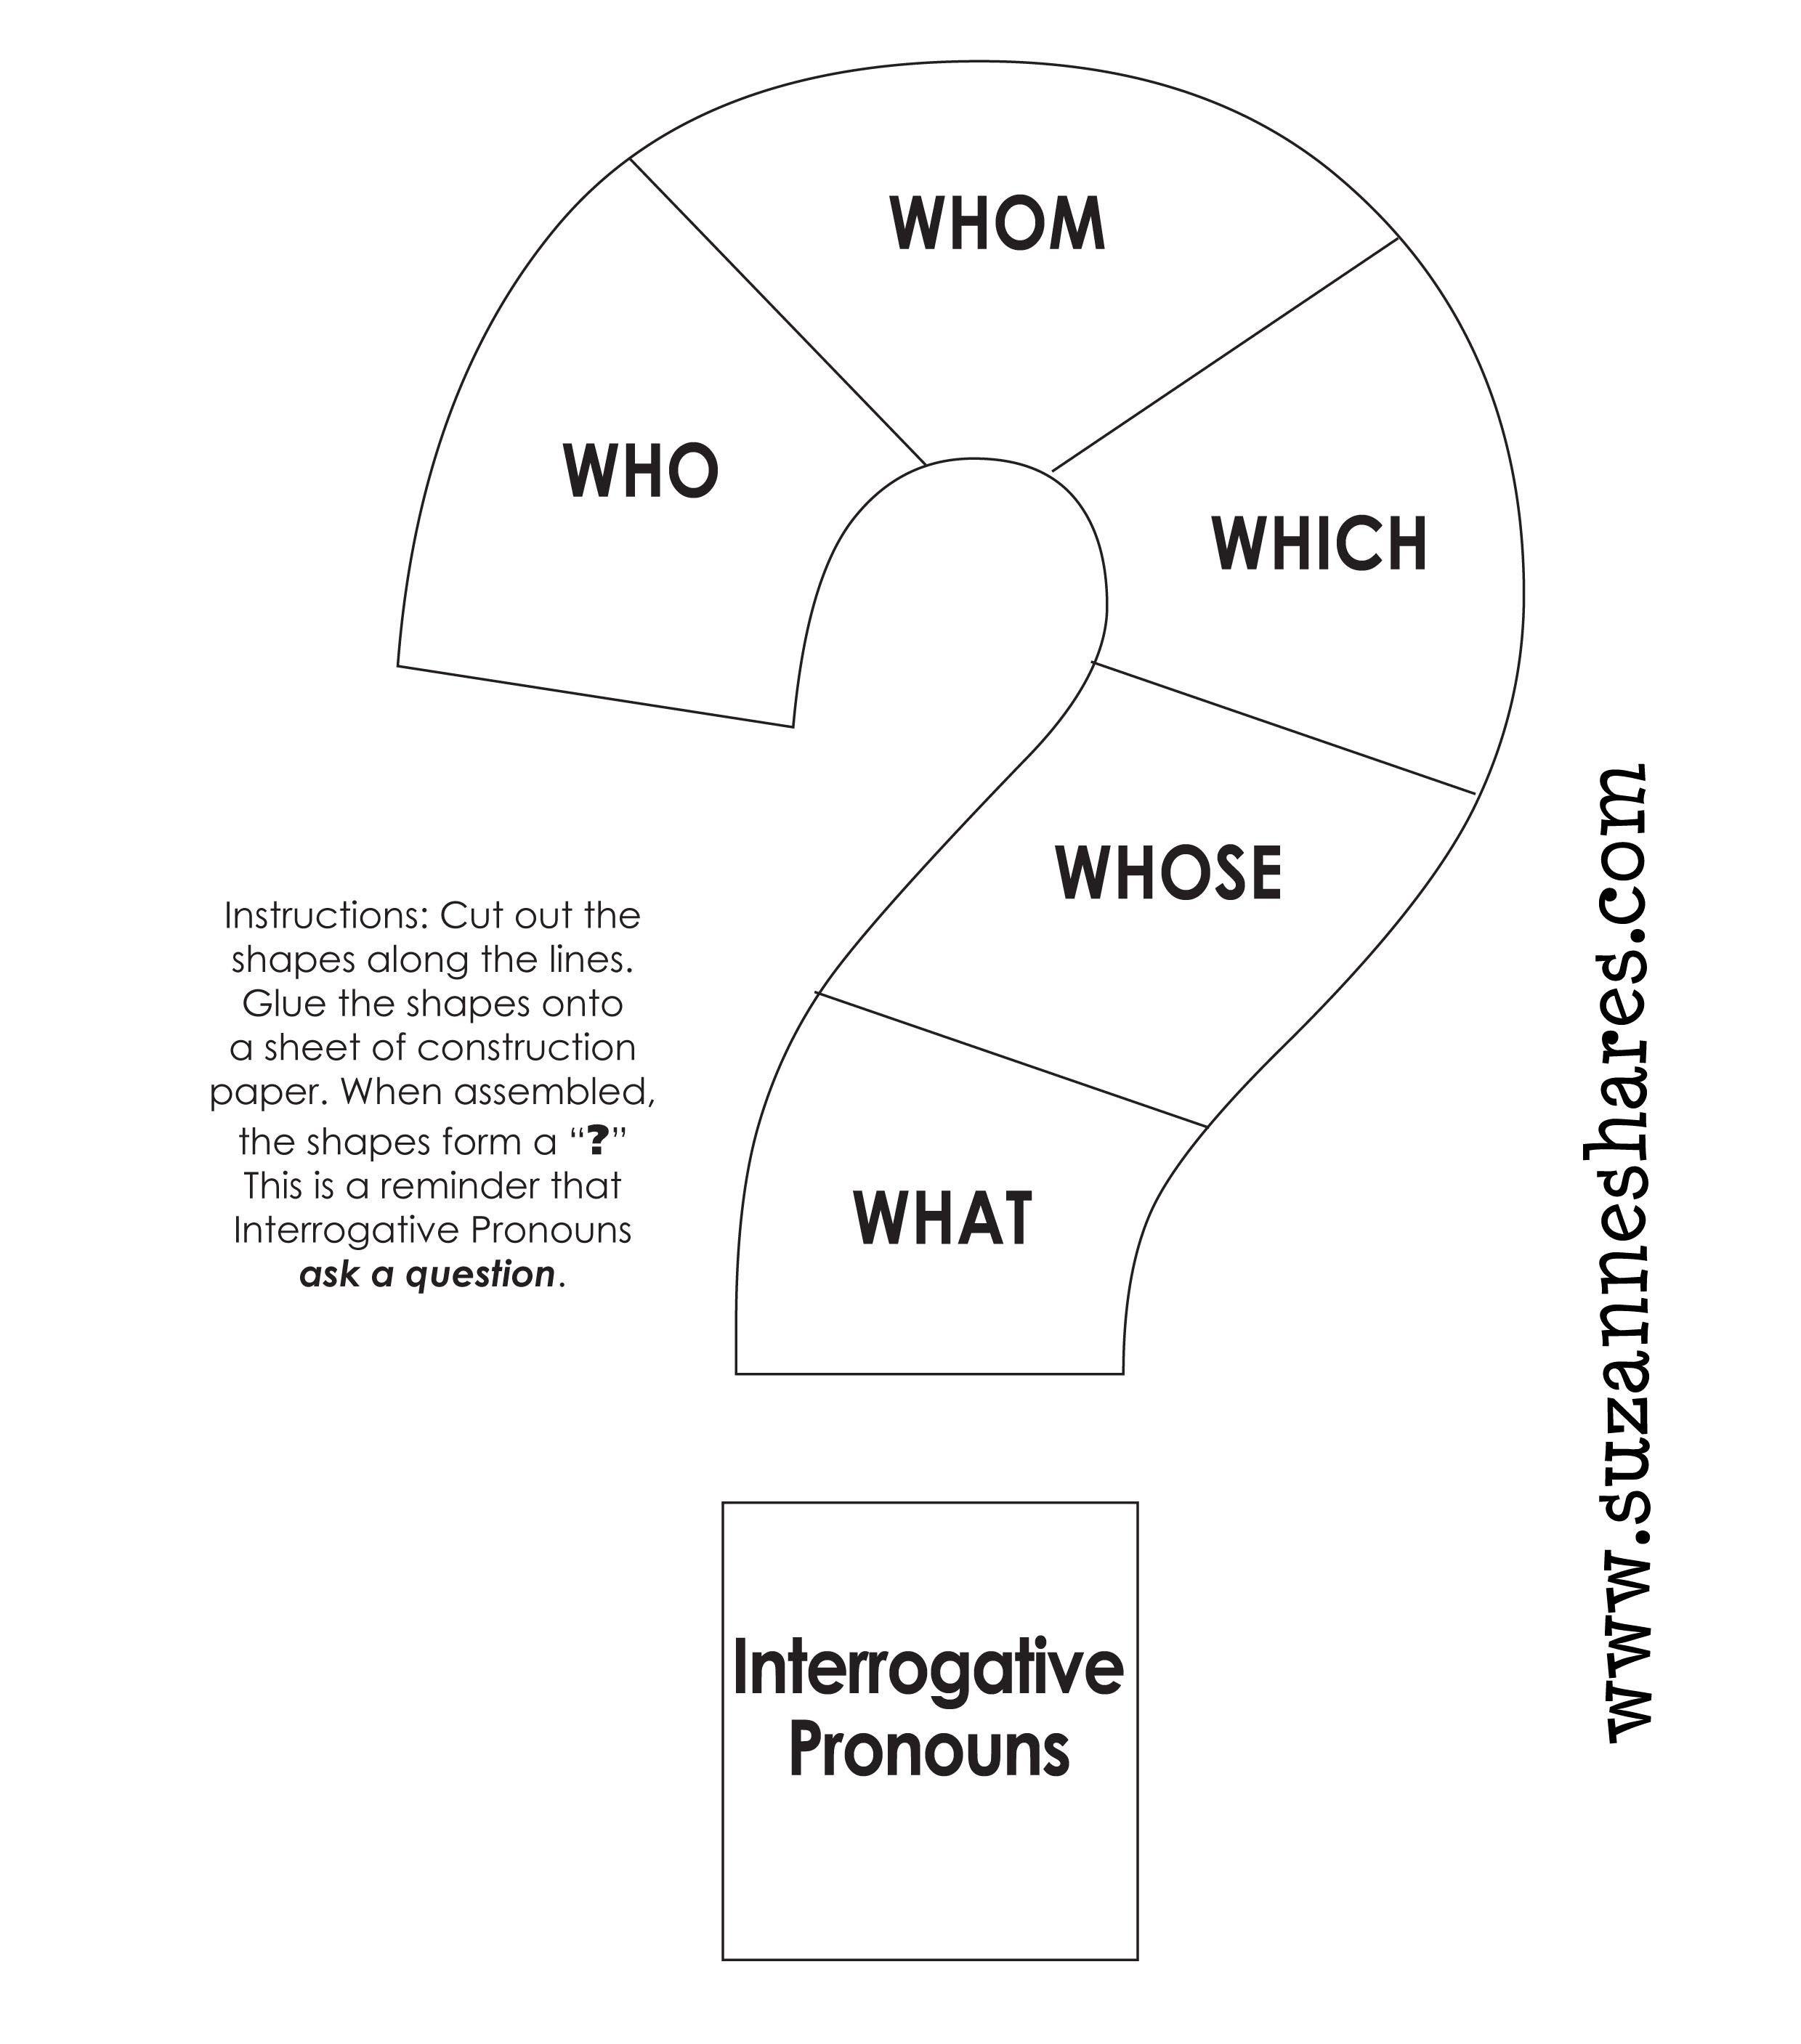 Interrogative Pronoun Picture Cycle 2 Weeks 9 10